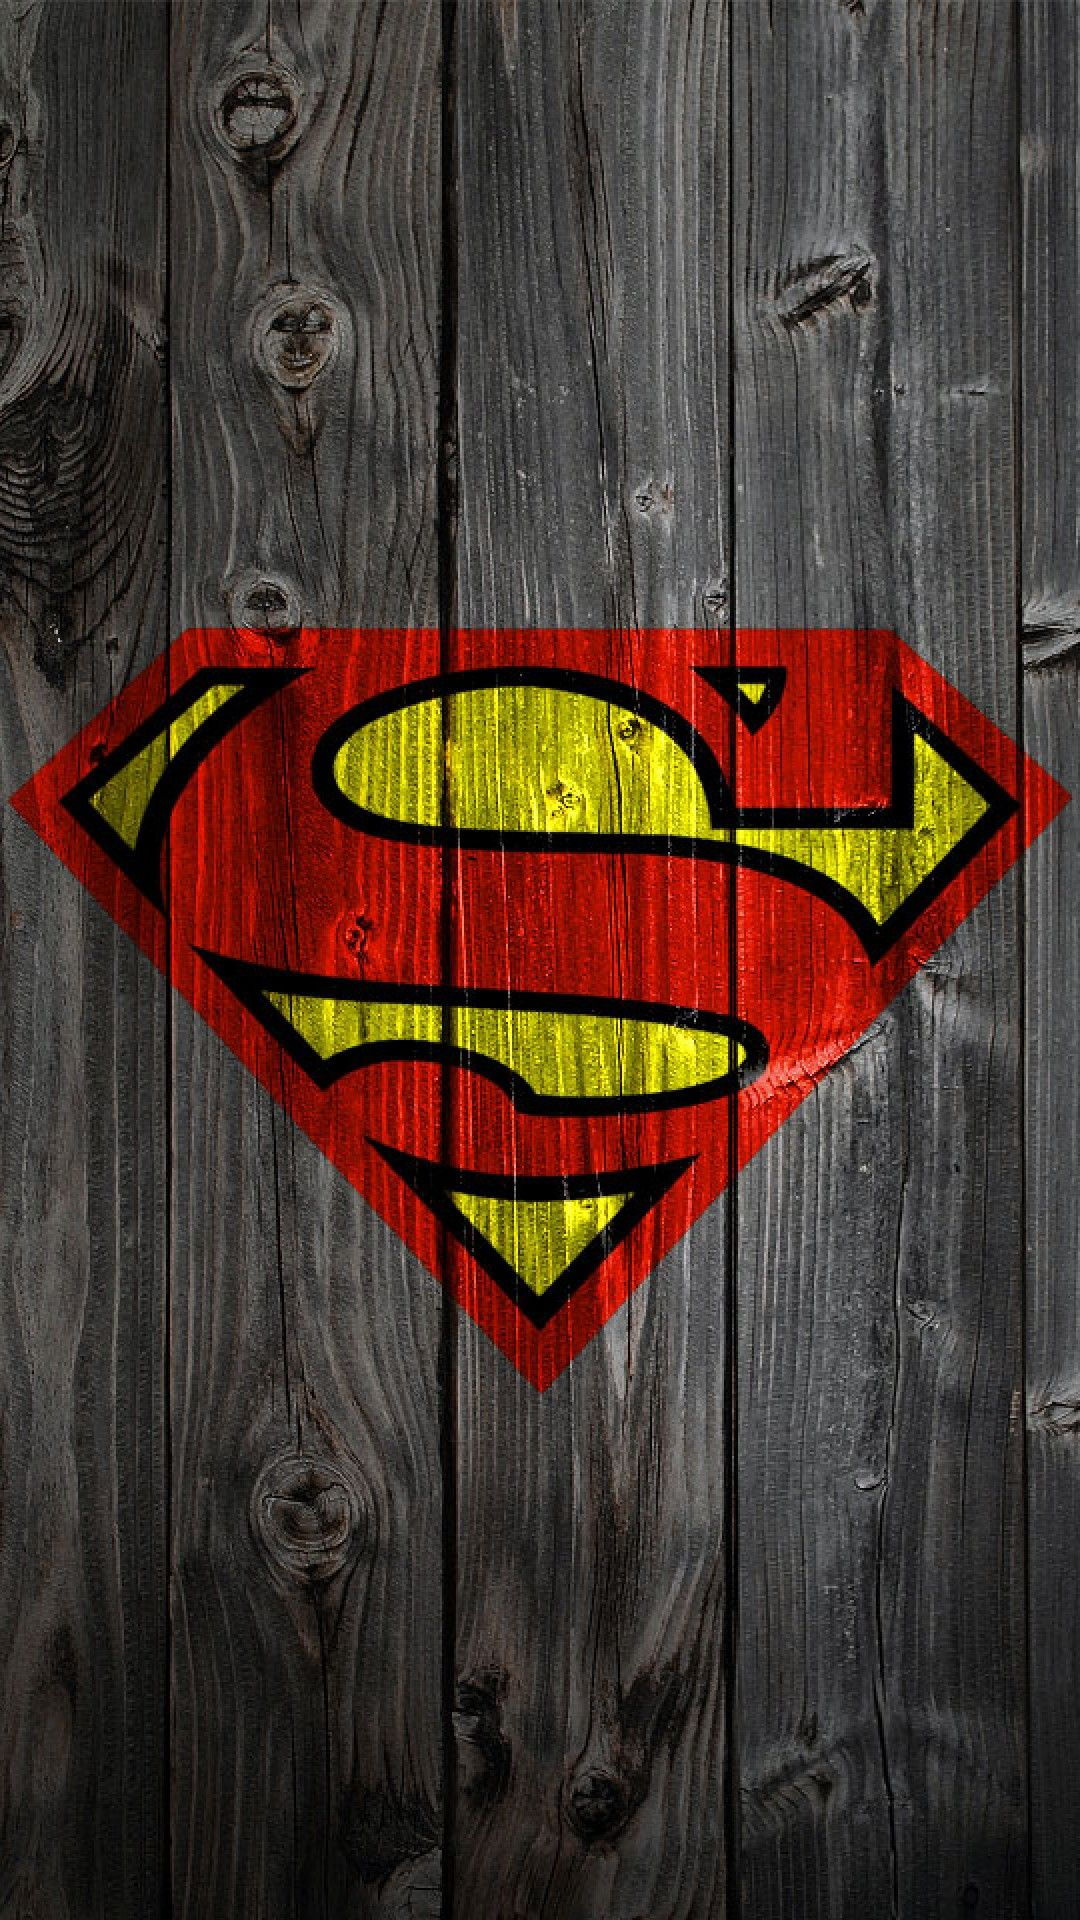 Wallpaper iphone superhero - Iphone Wallpaper Superman Logo On Wood